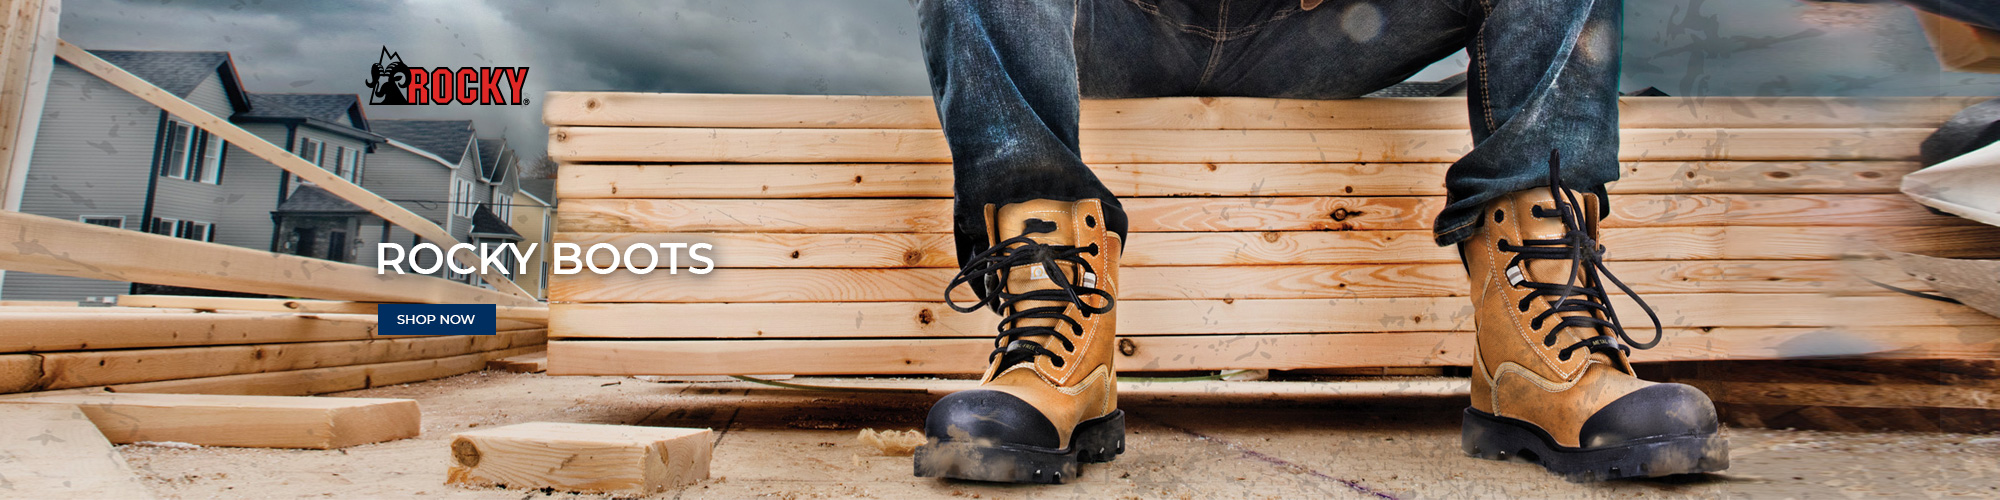 rockey boots